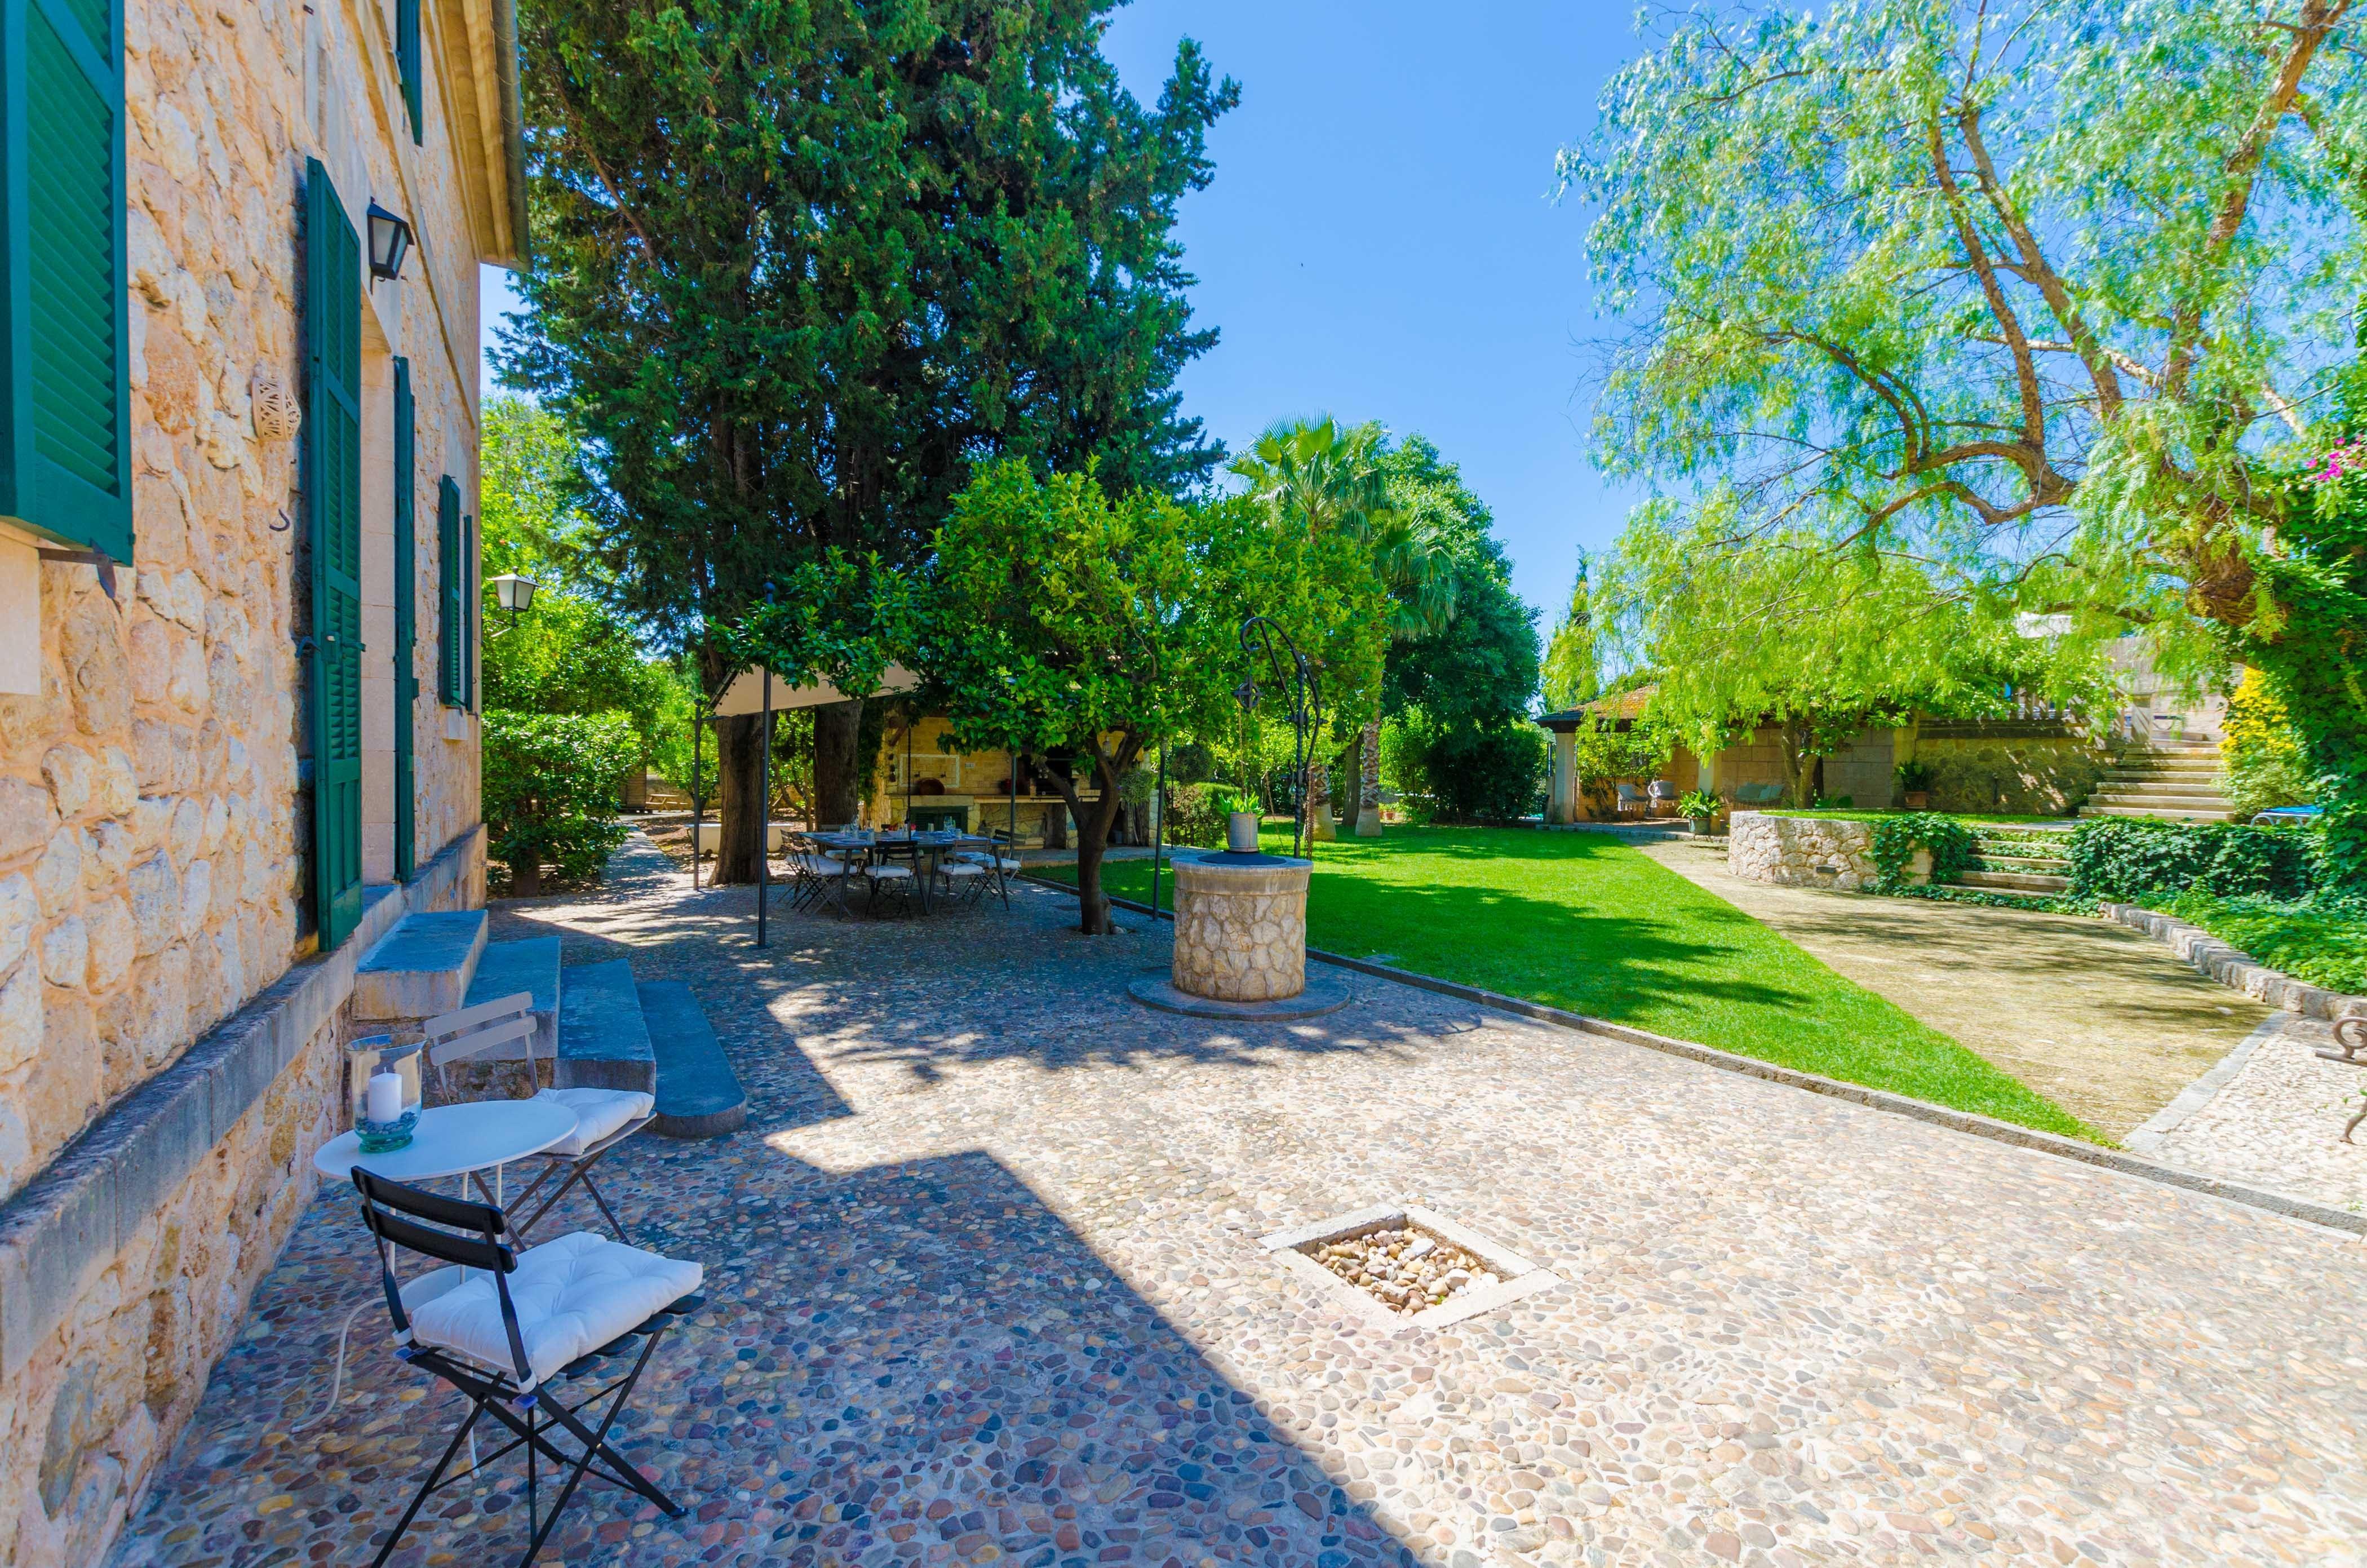 Maison de vacances CAS CONVIDATS (2435013), Alaro, Majorque, Iles Baléares, Espagne, image 72